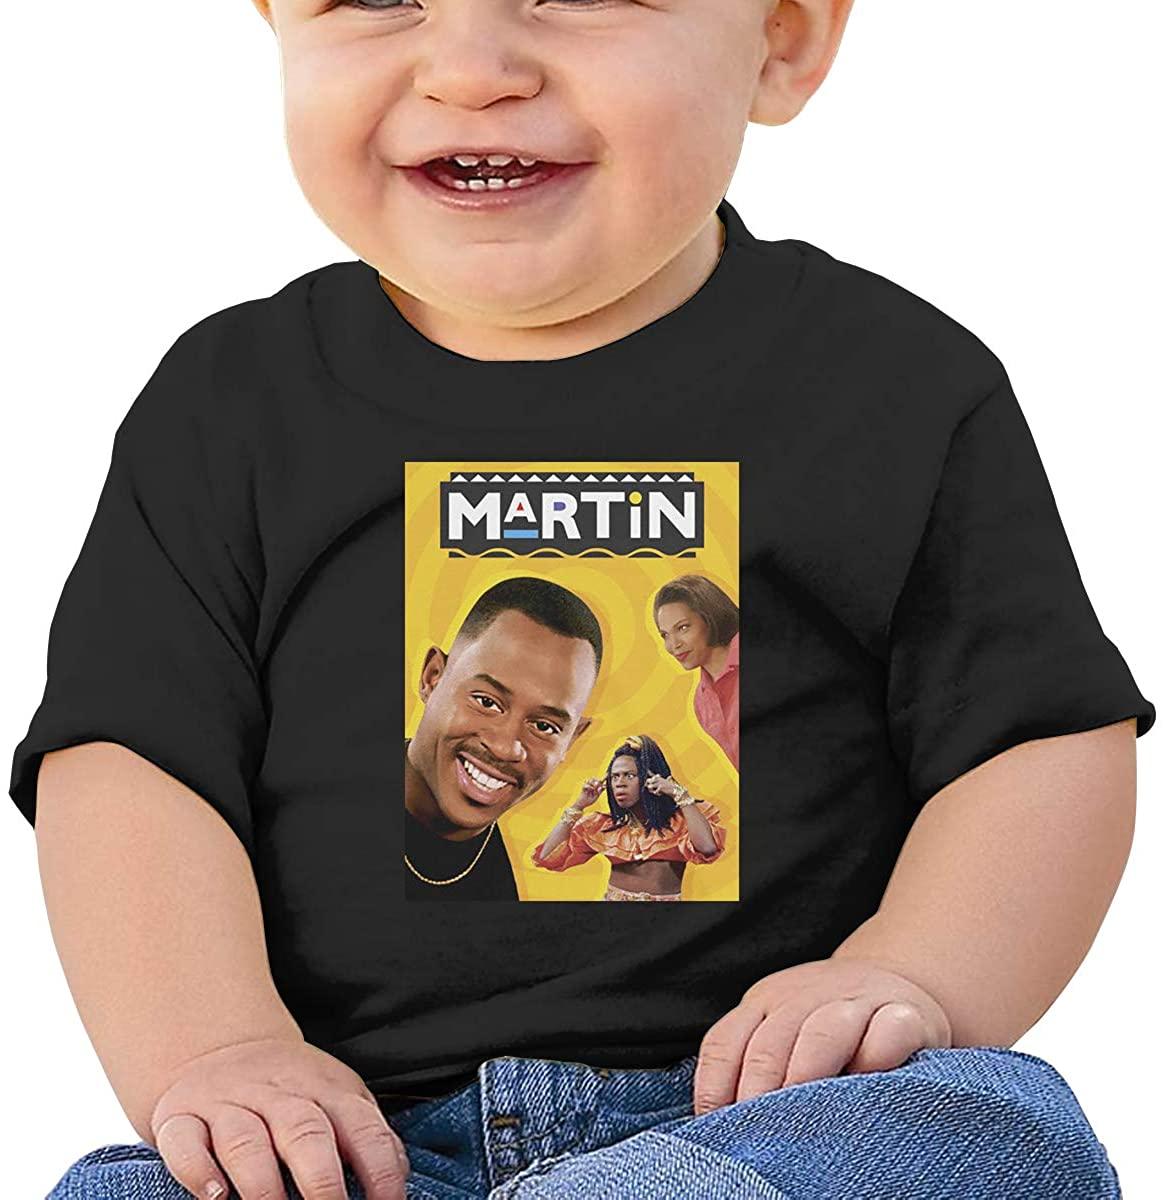 Martin Lawrence Toddler Baby Clothes Cotton T-Shirt Black Vintage Short Sleeve Shirt